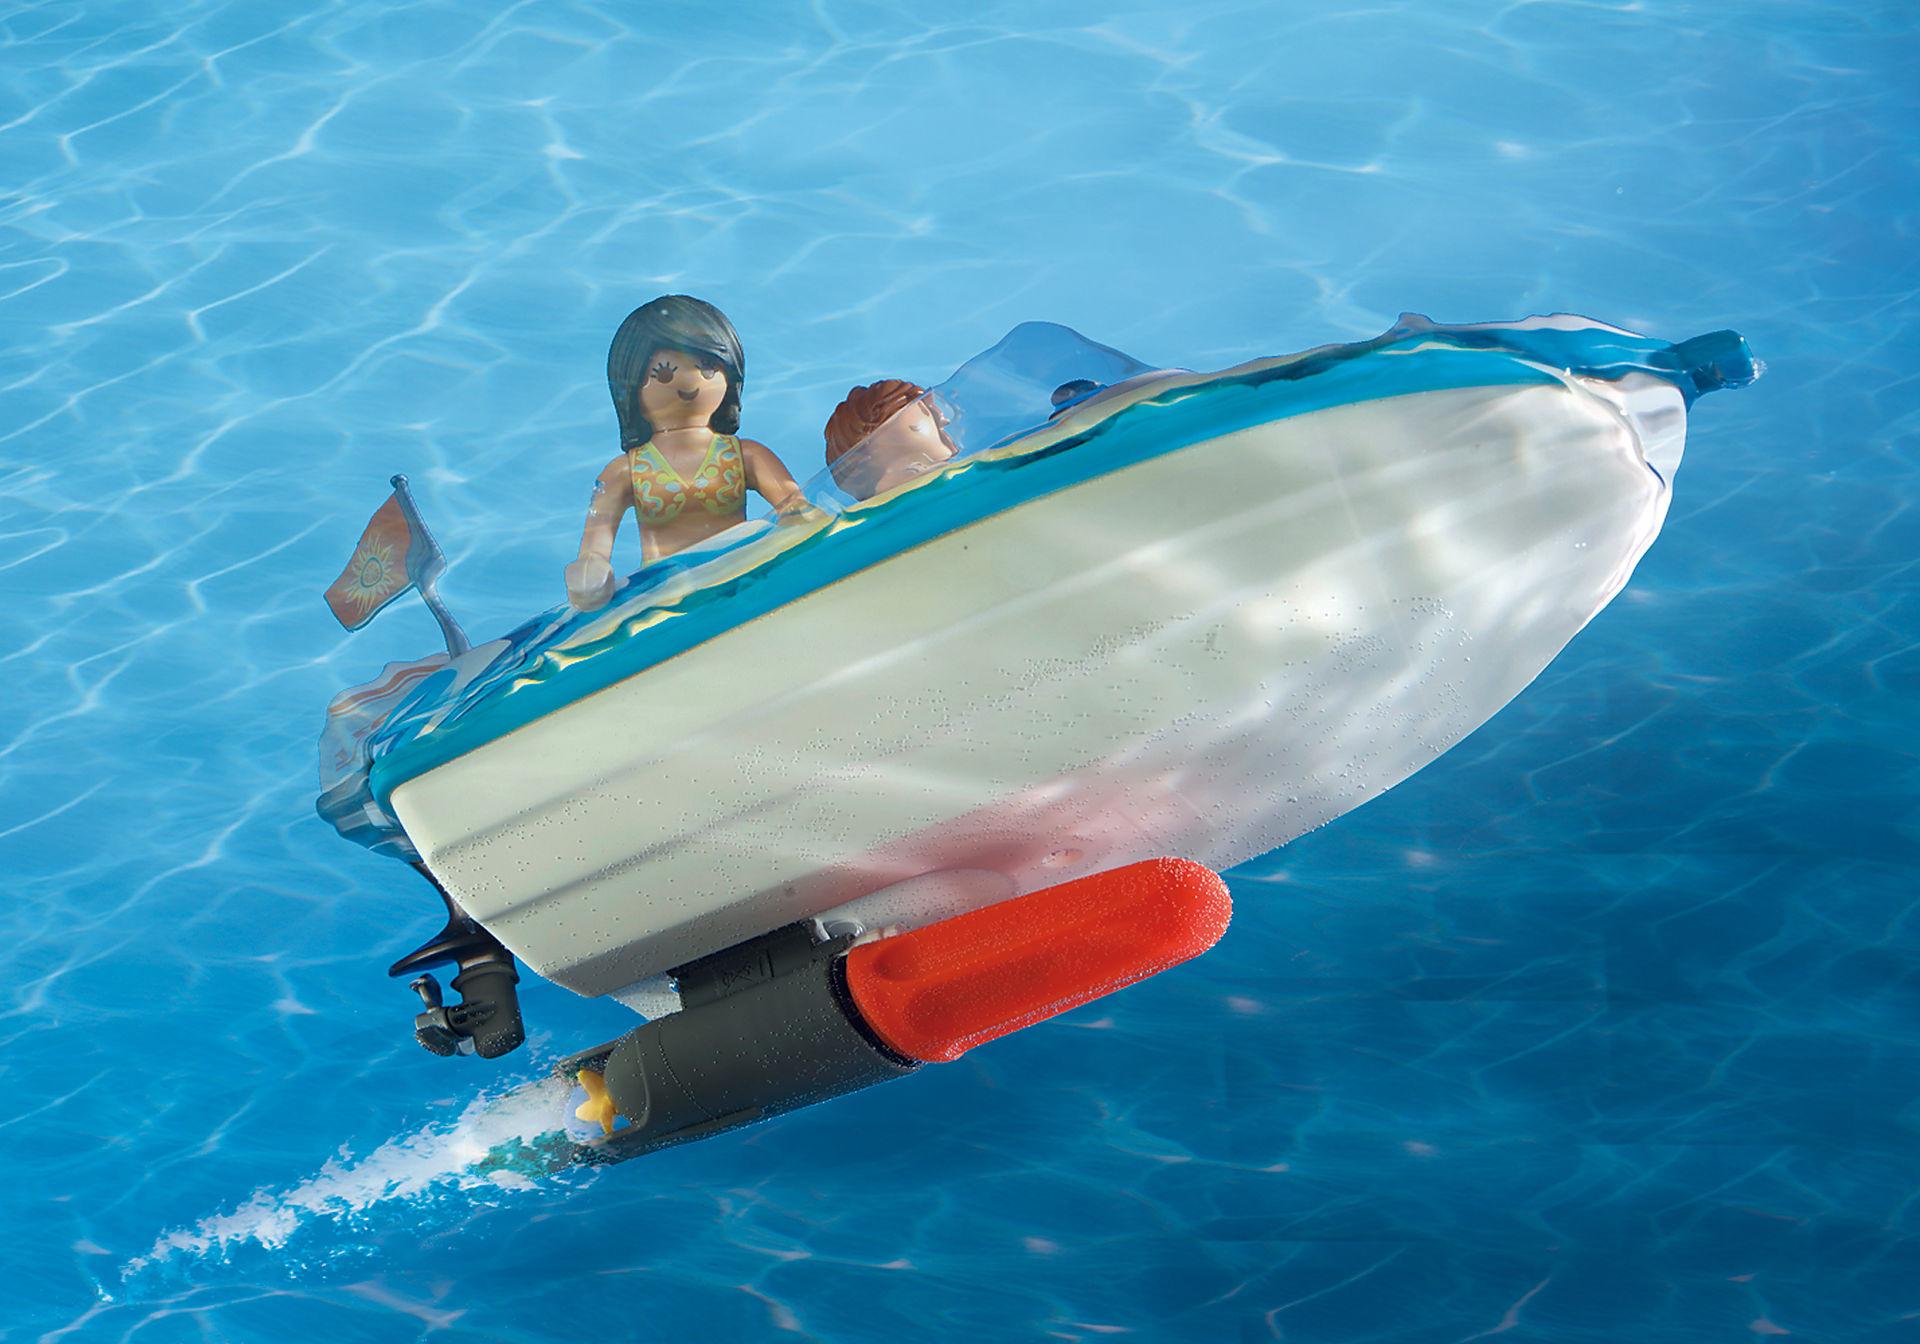 http://media.playmobil.com/i/playmobil/6864_product_extra3/Voiture  avec bateau et moteur submersible